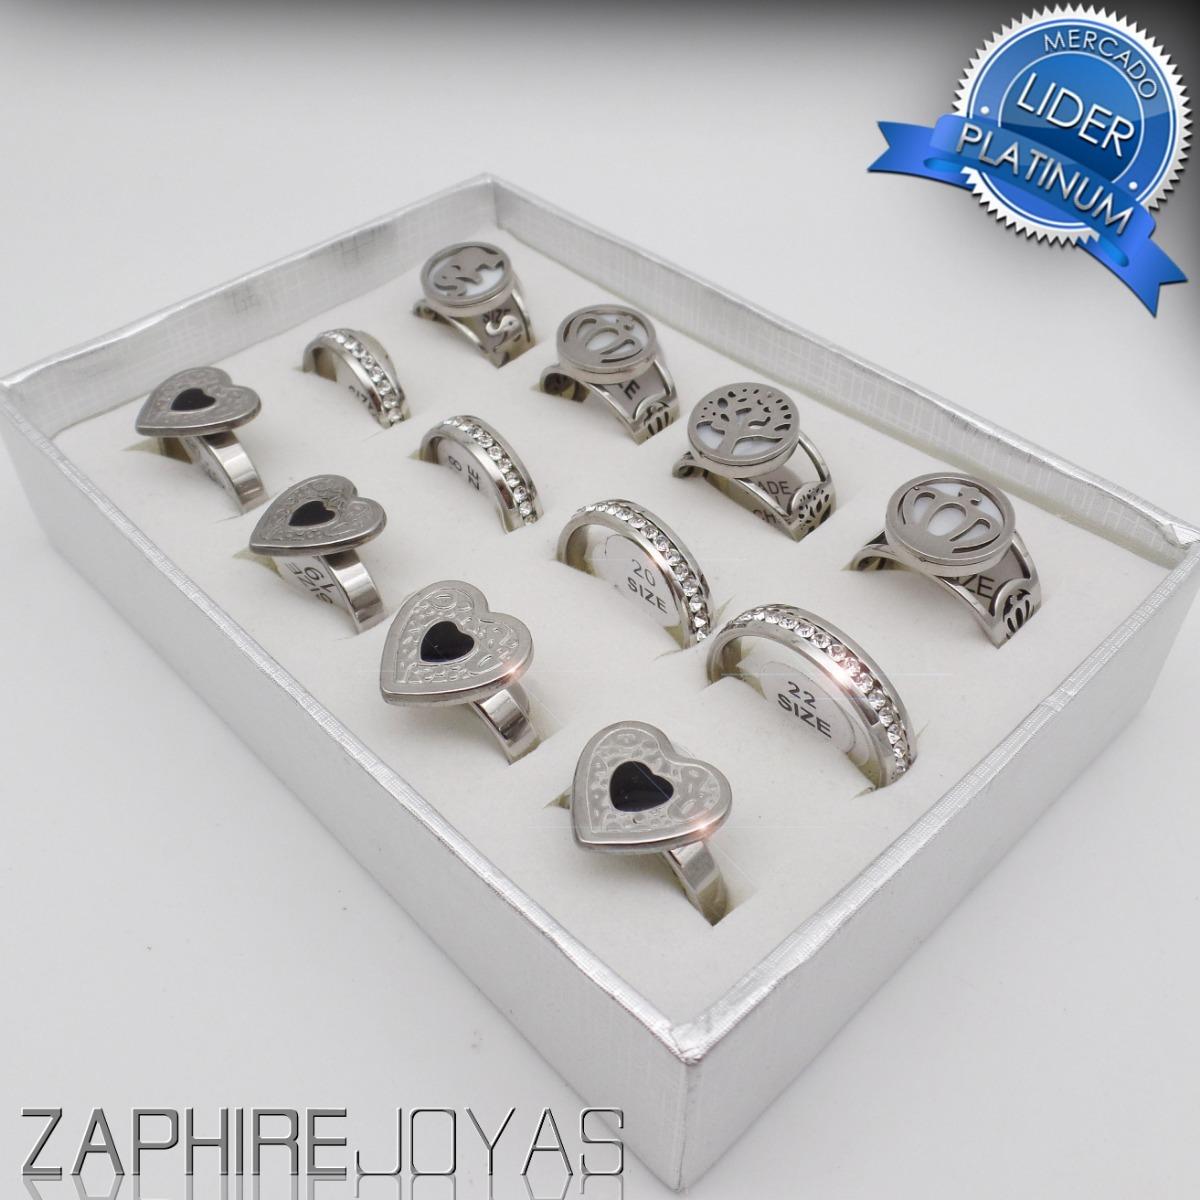 8db78b2aaf68 set 12 hermosos anillos acero quirurgico 316l xmayor n112. Cargando zoom.